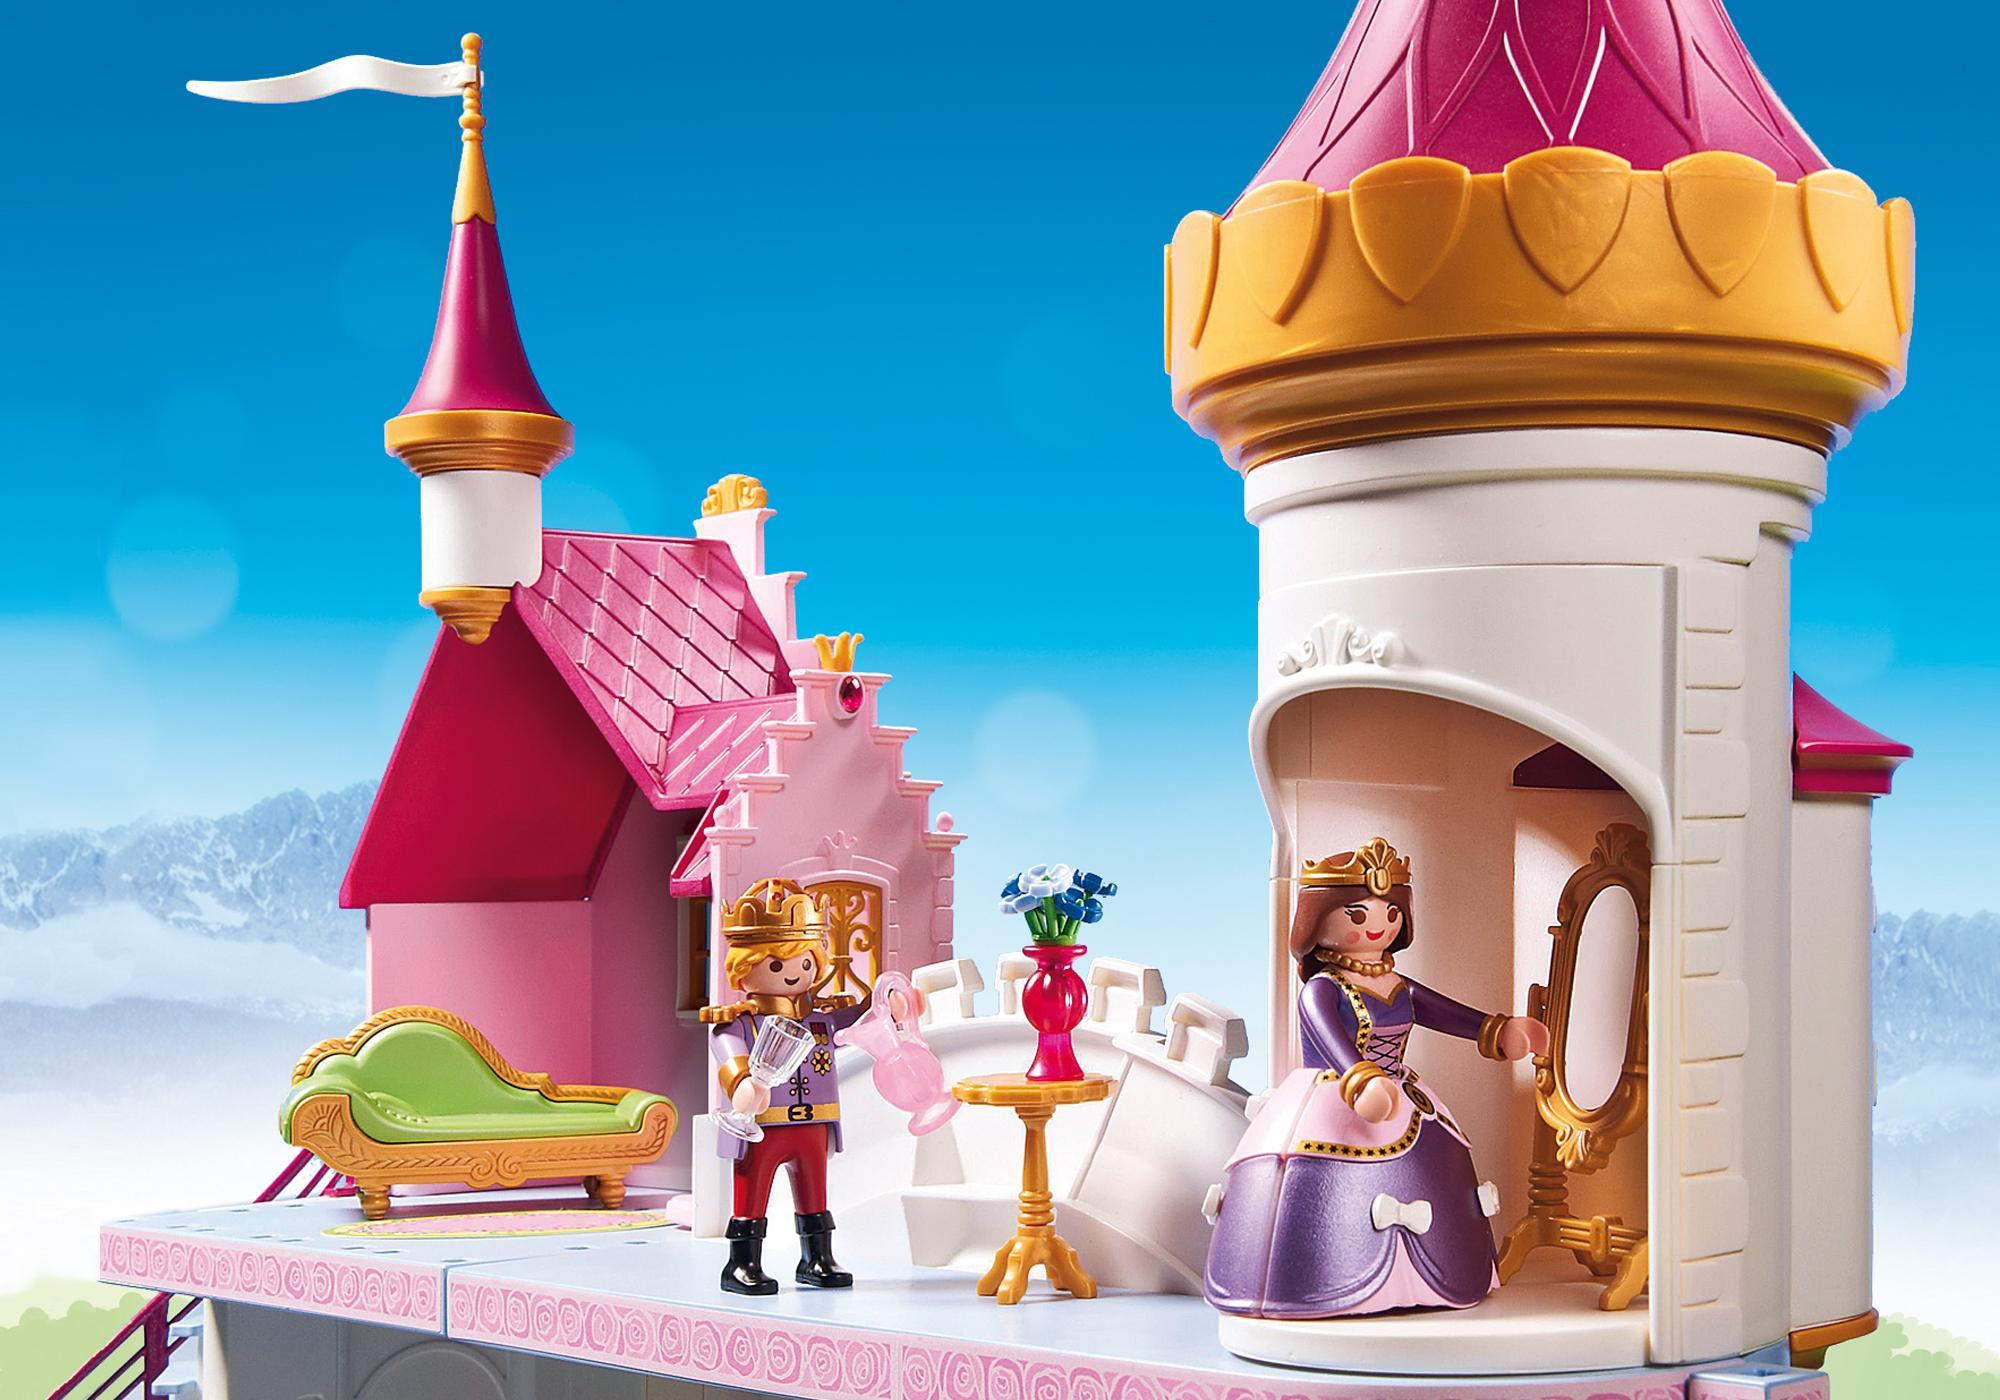 http://media.playmobil.com/i/playmobil/6849_product_extra1/Замок Принцессы: Королевская Резиденция